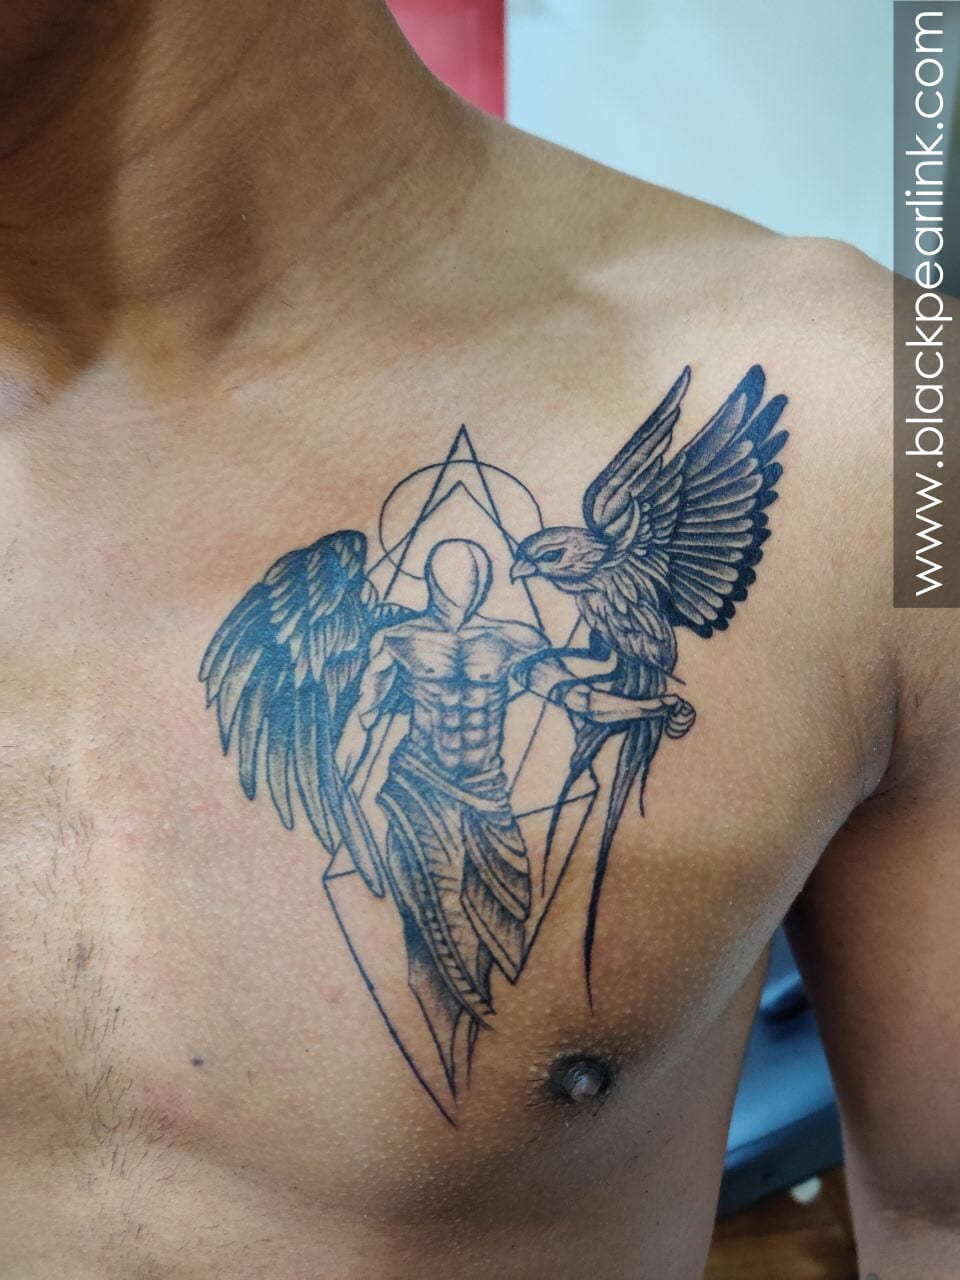 Angel Tattoo on Chest